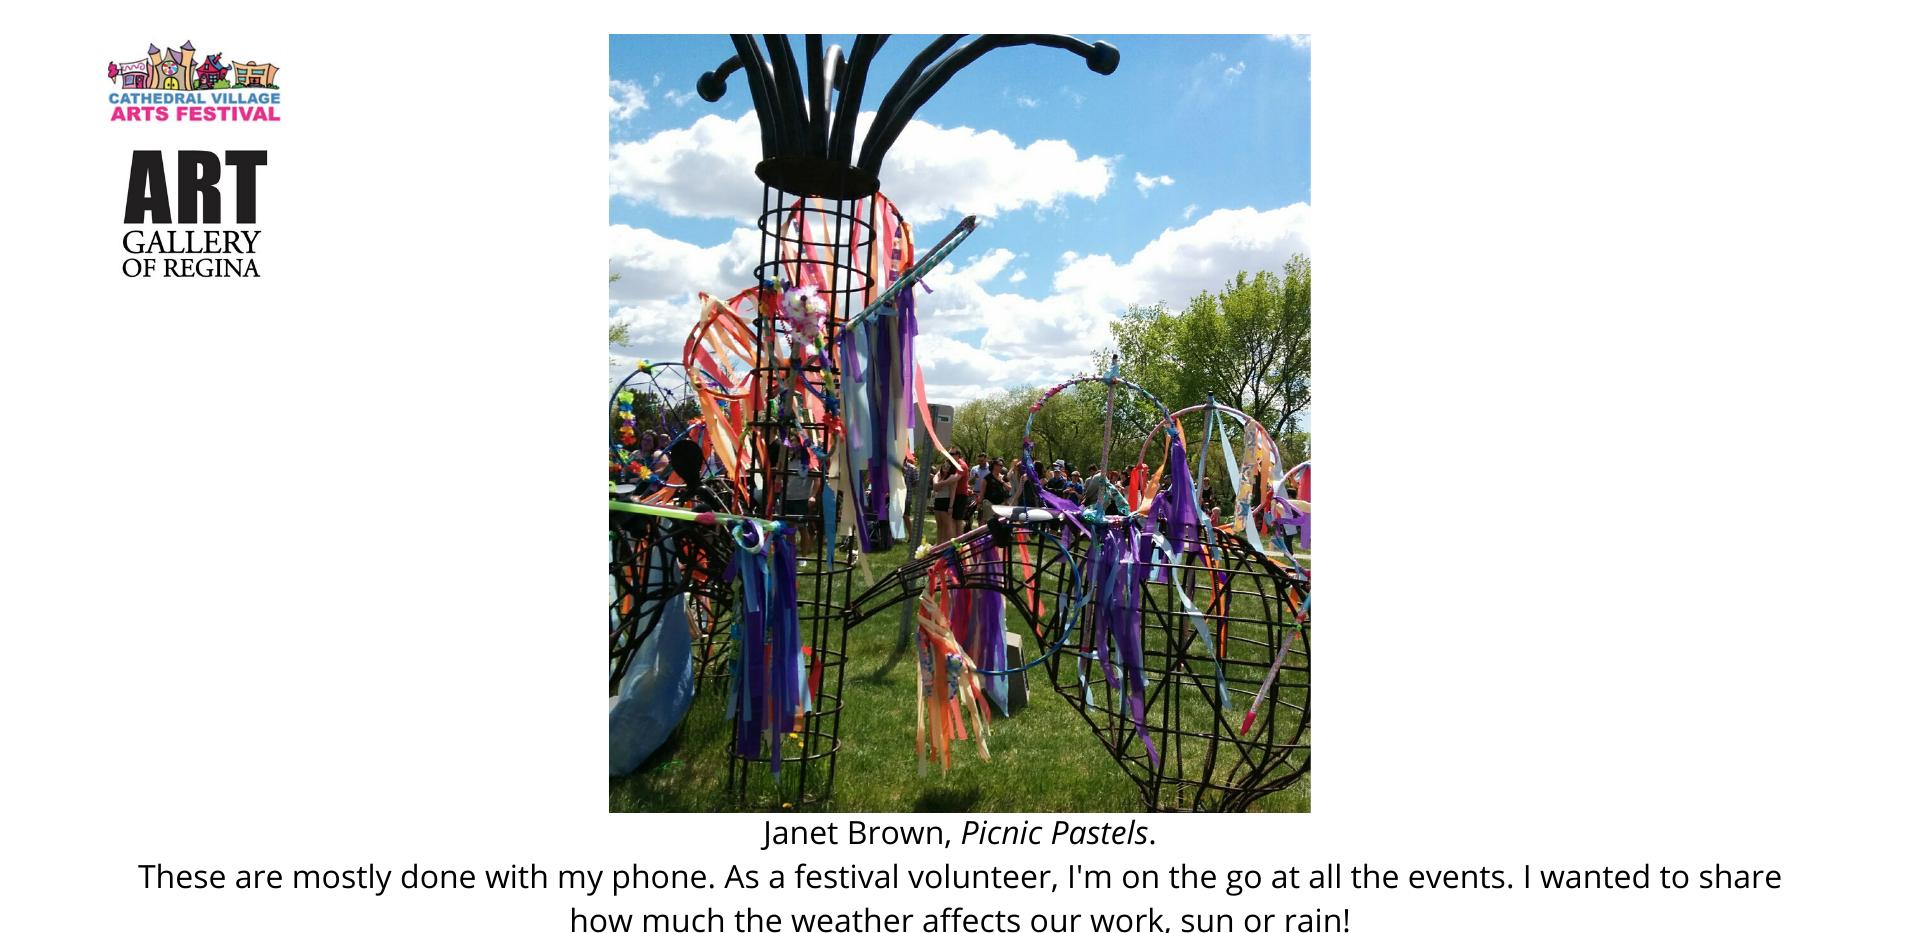 Janet Brown,Picnic Pastels.